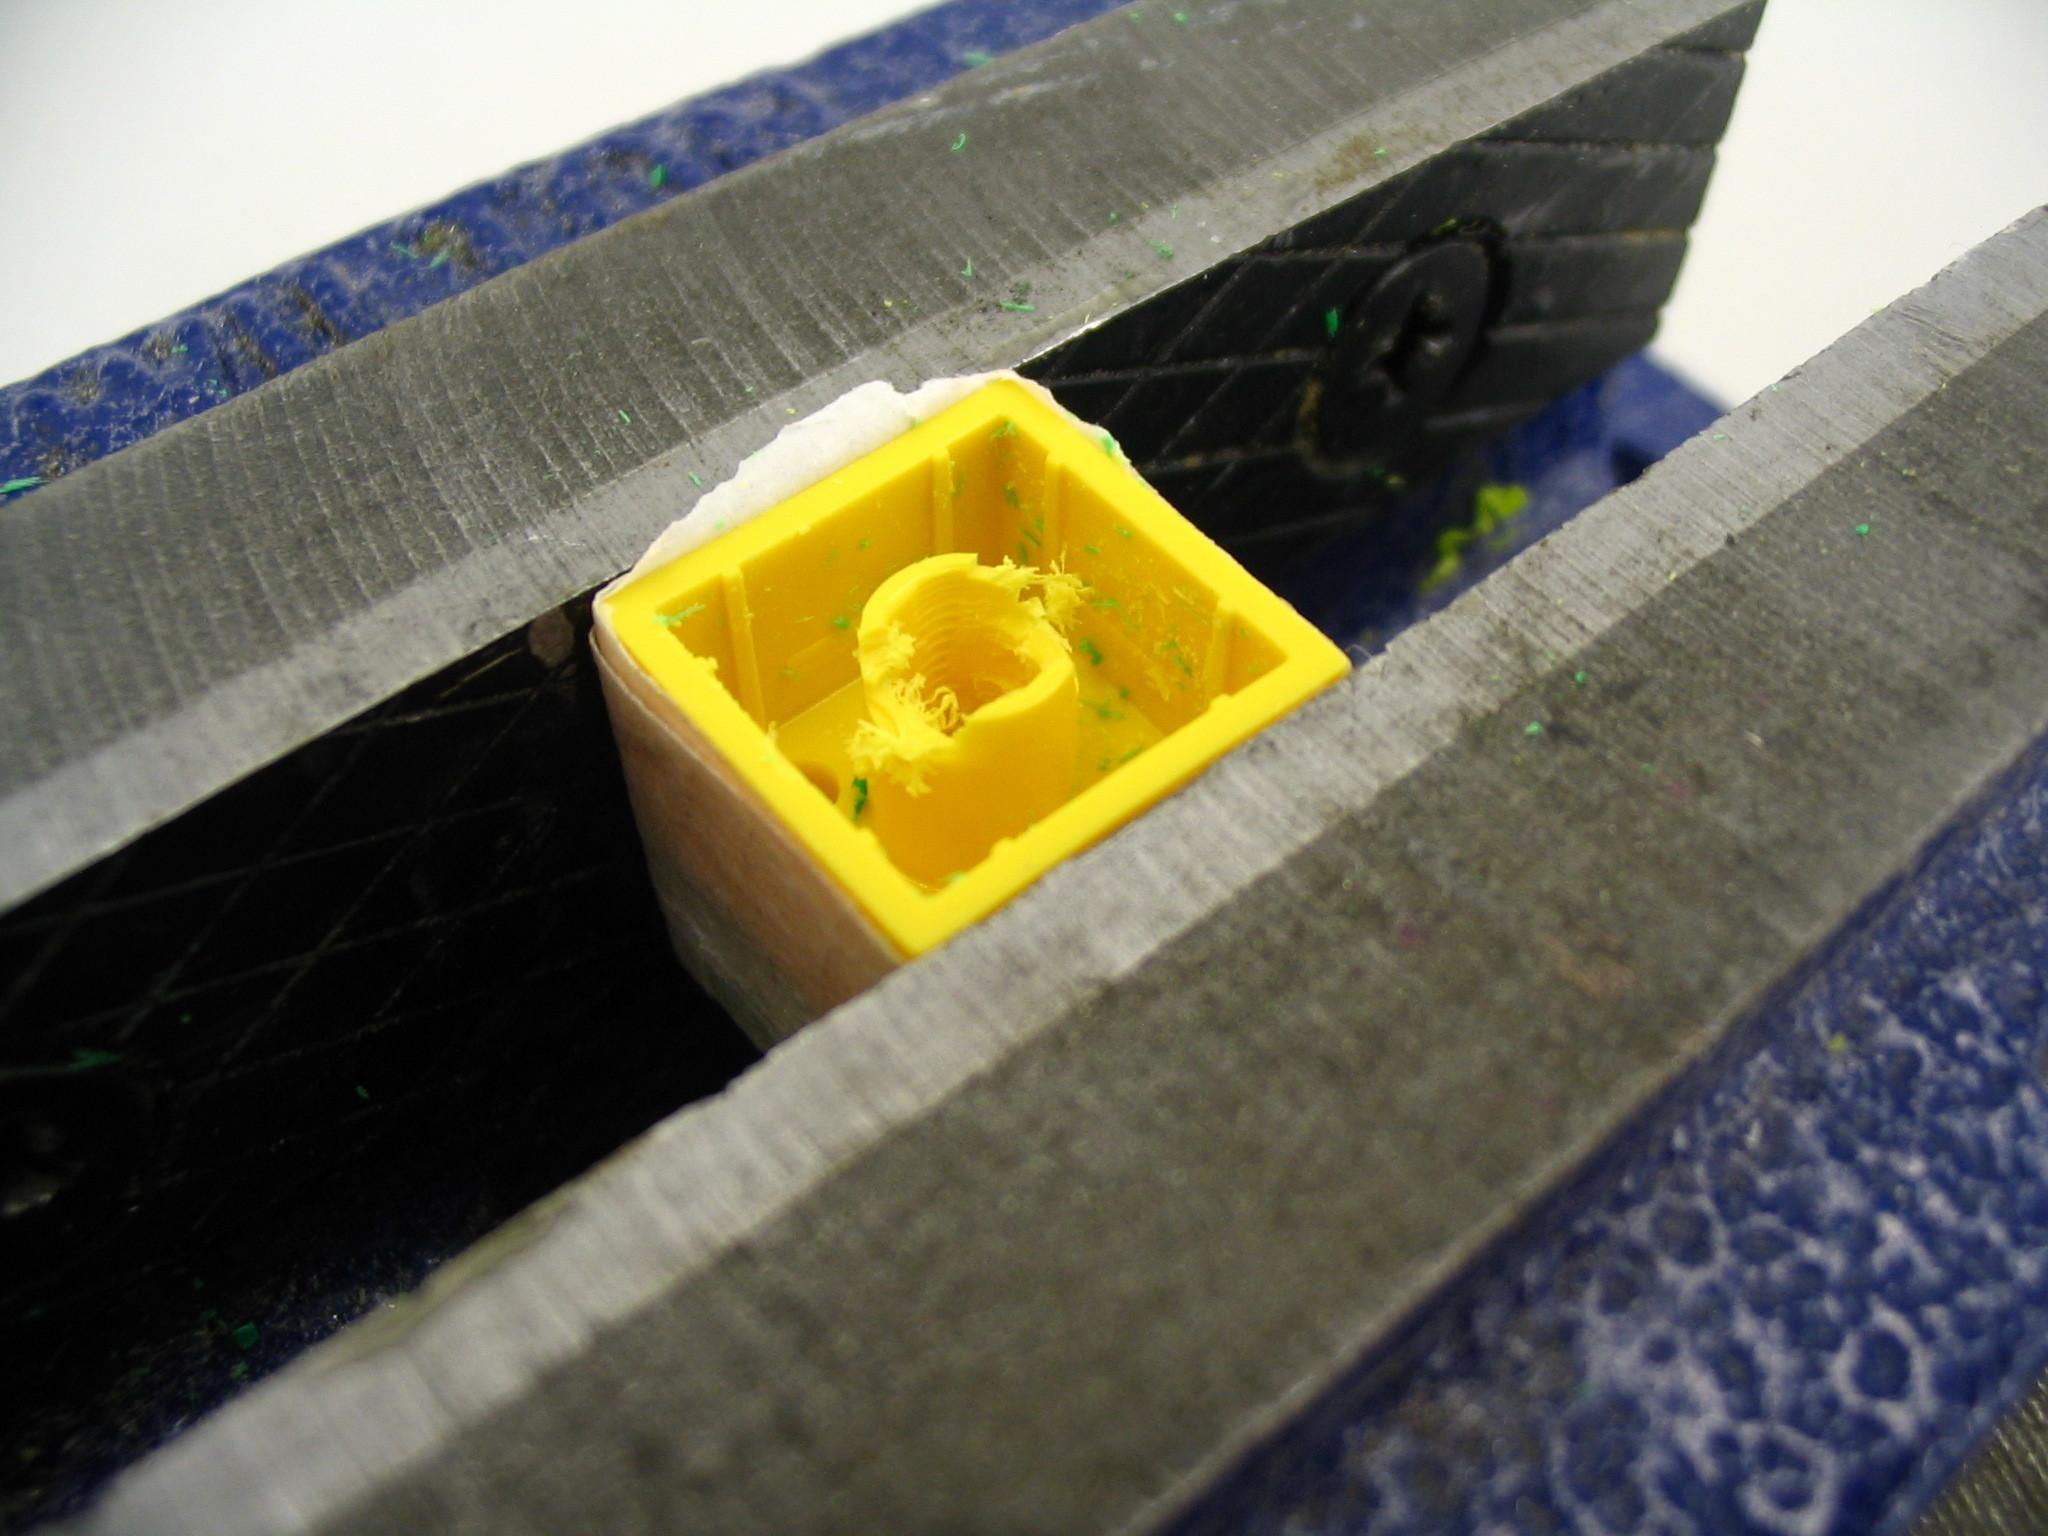 how to make a lego usb